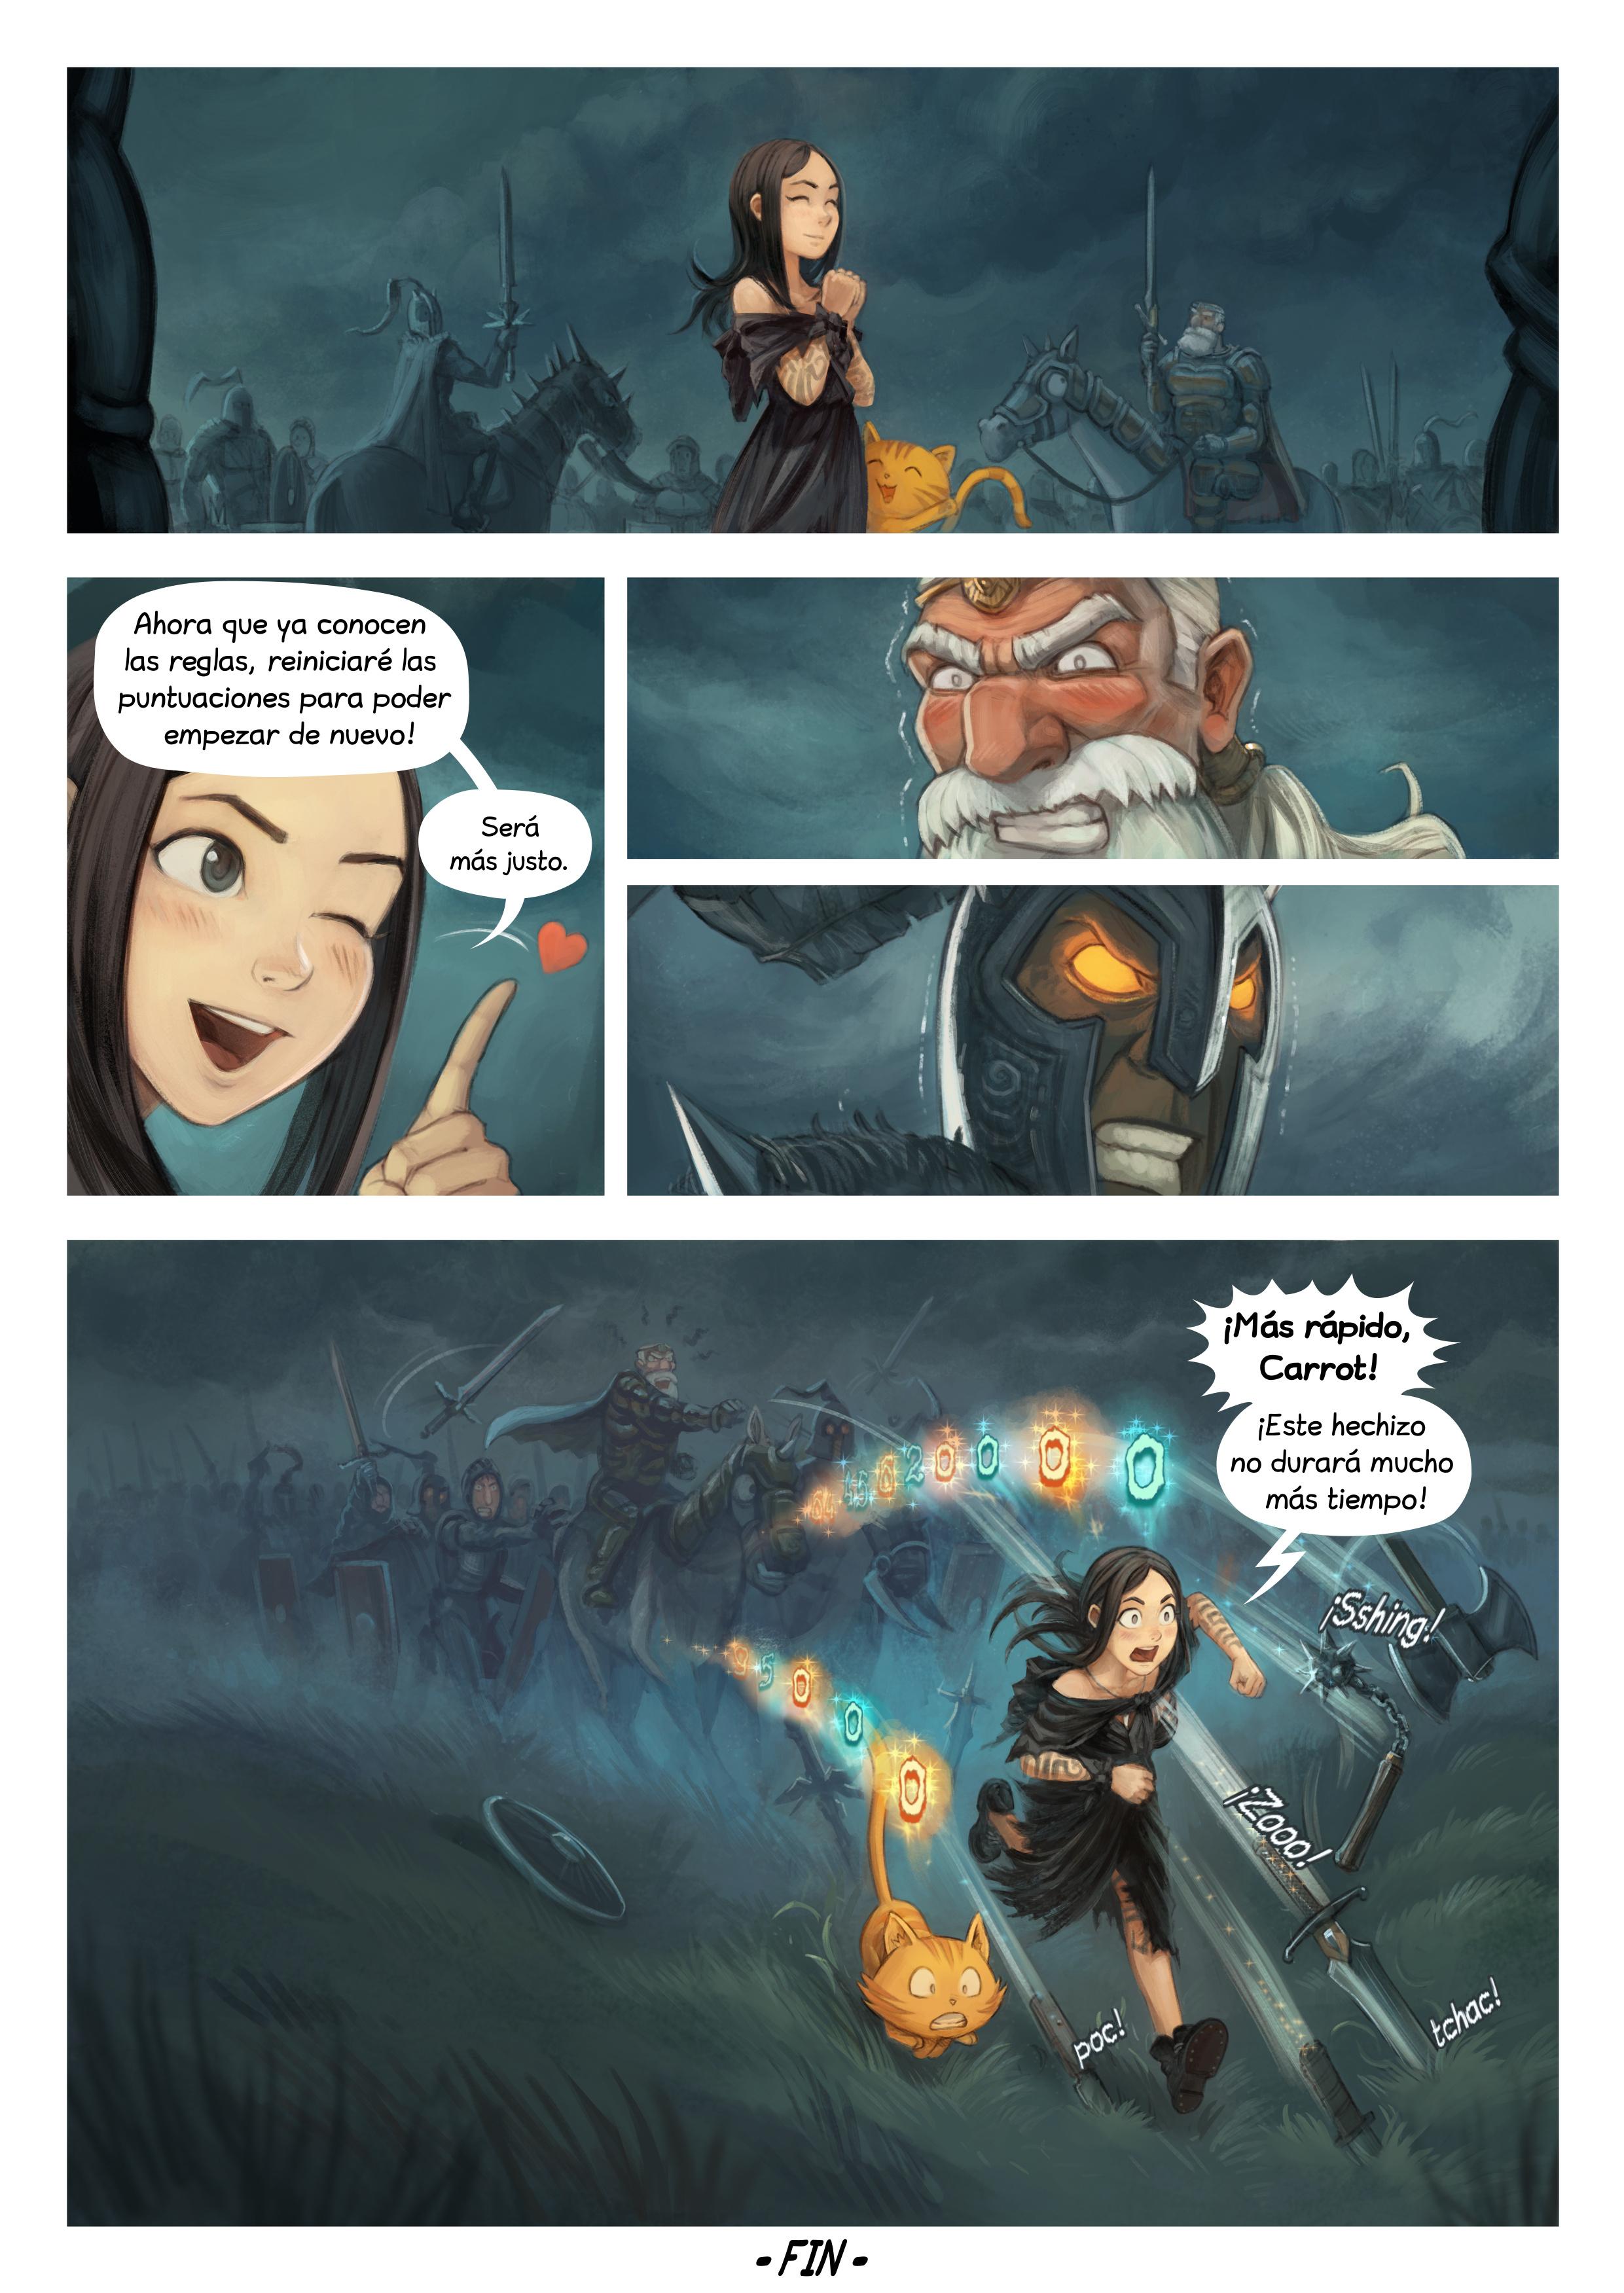 Episodio 33: Hechizo de guerra, Page 8